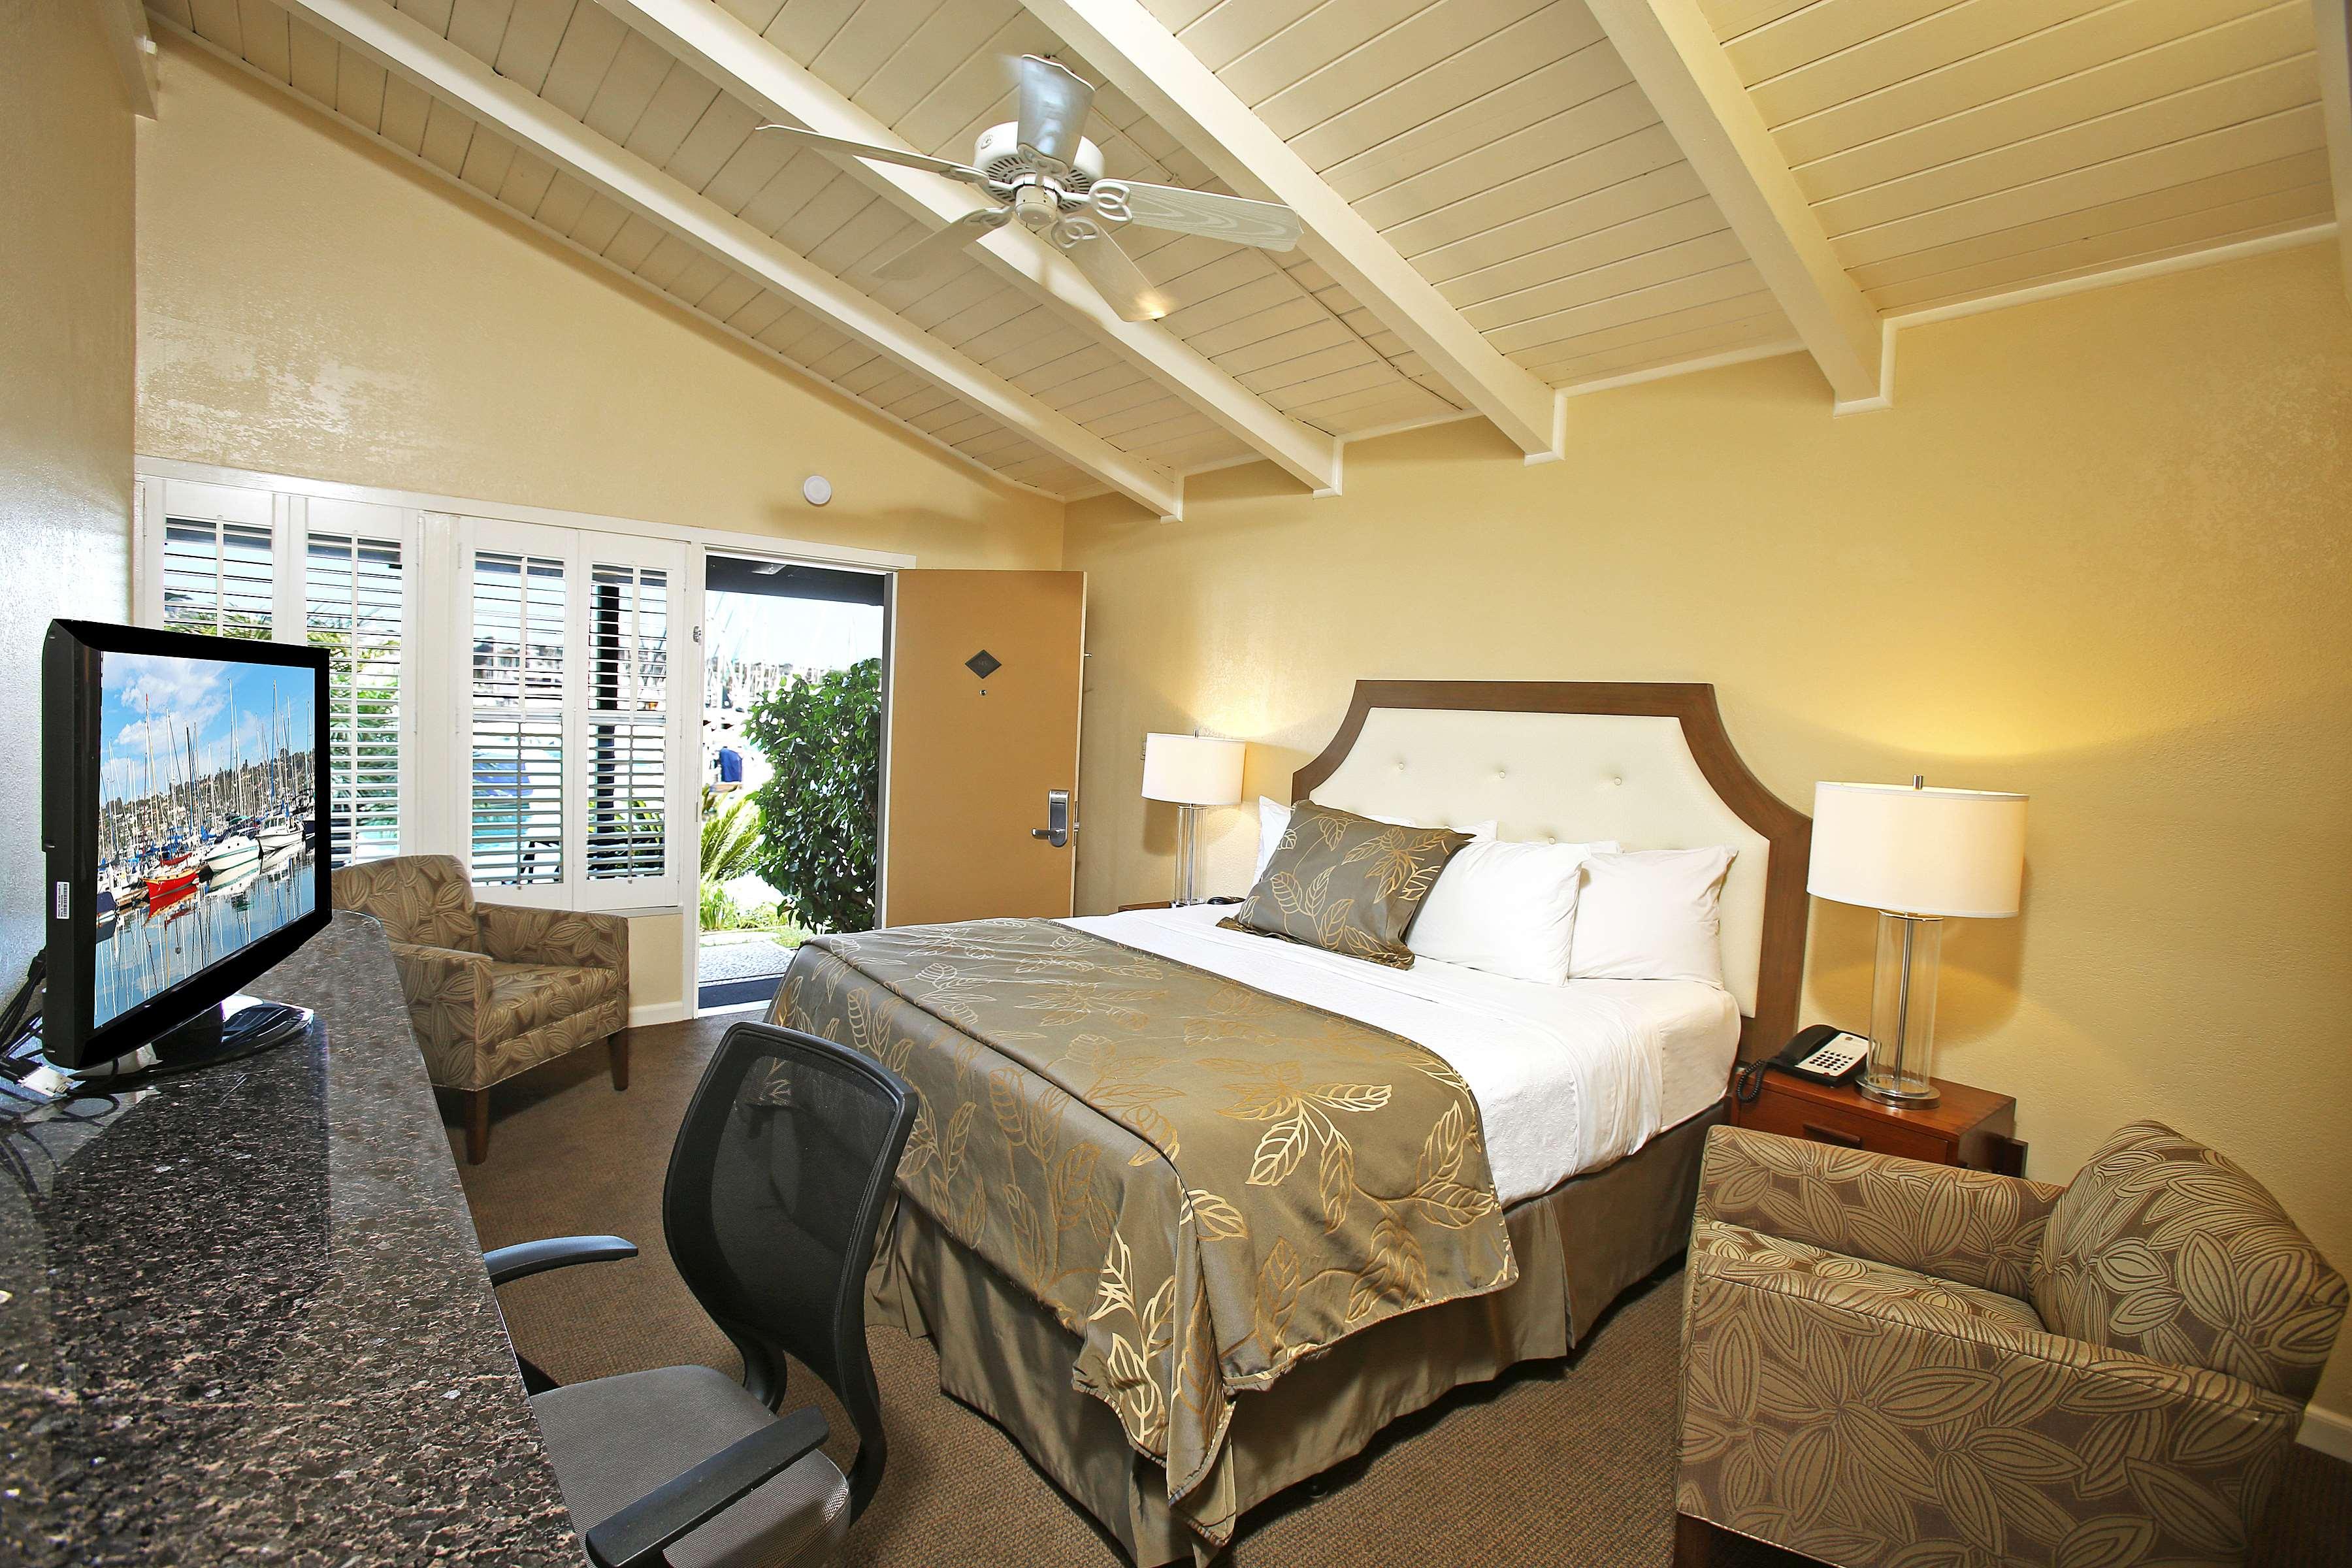 Best Western Plus Island Palms Hotel & Marina image 31